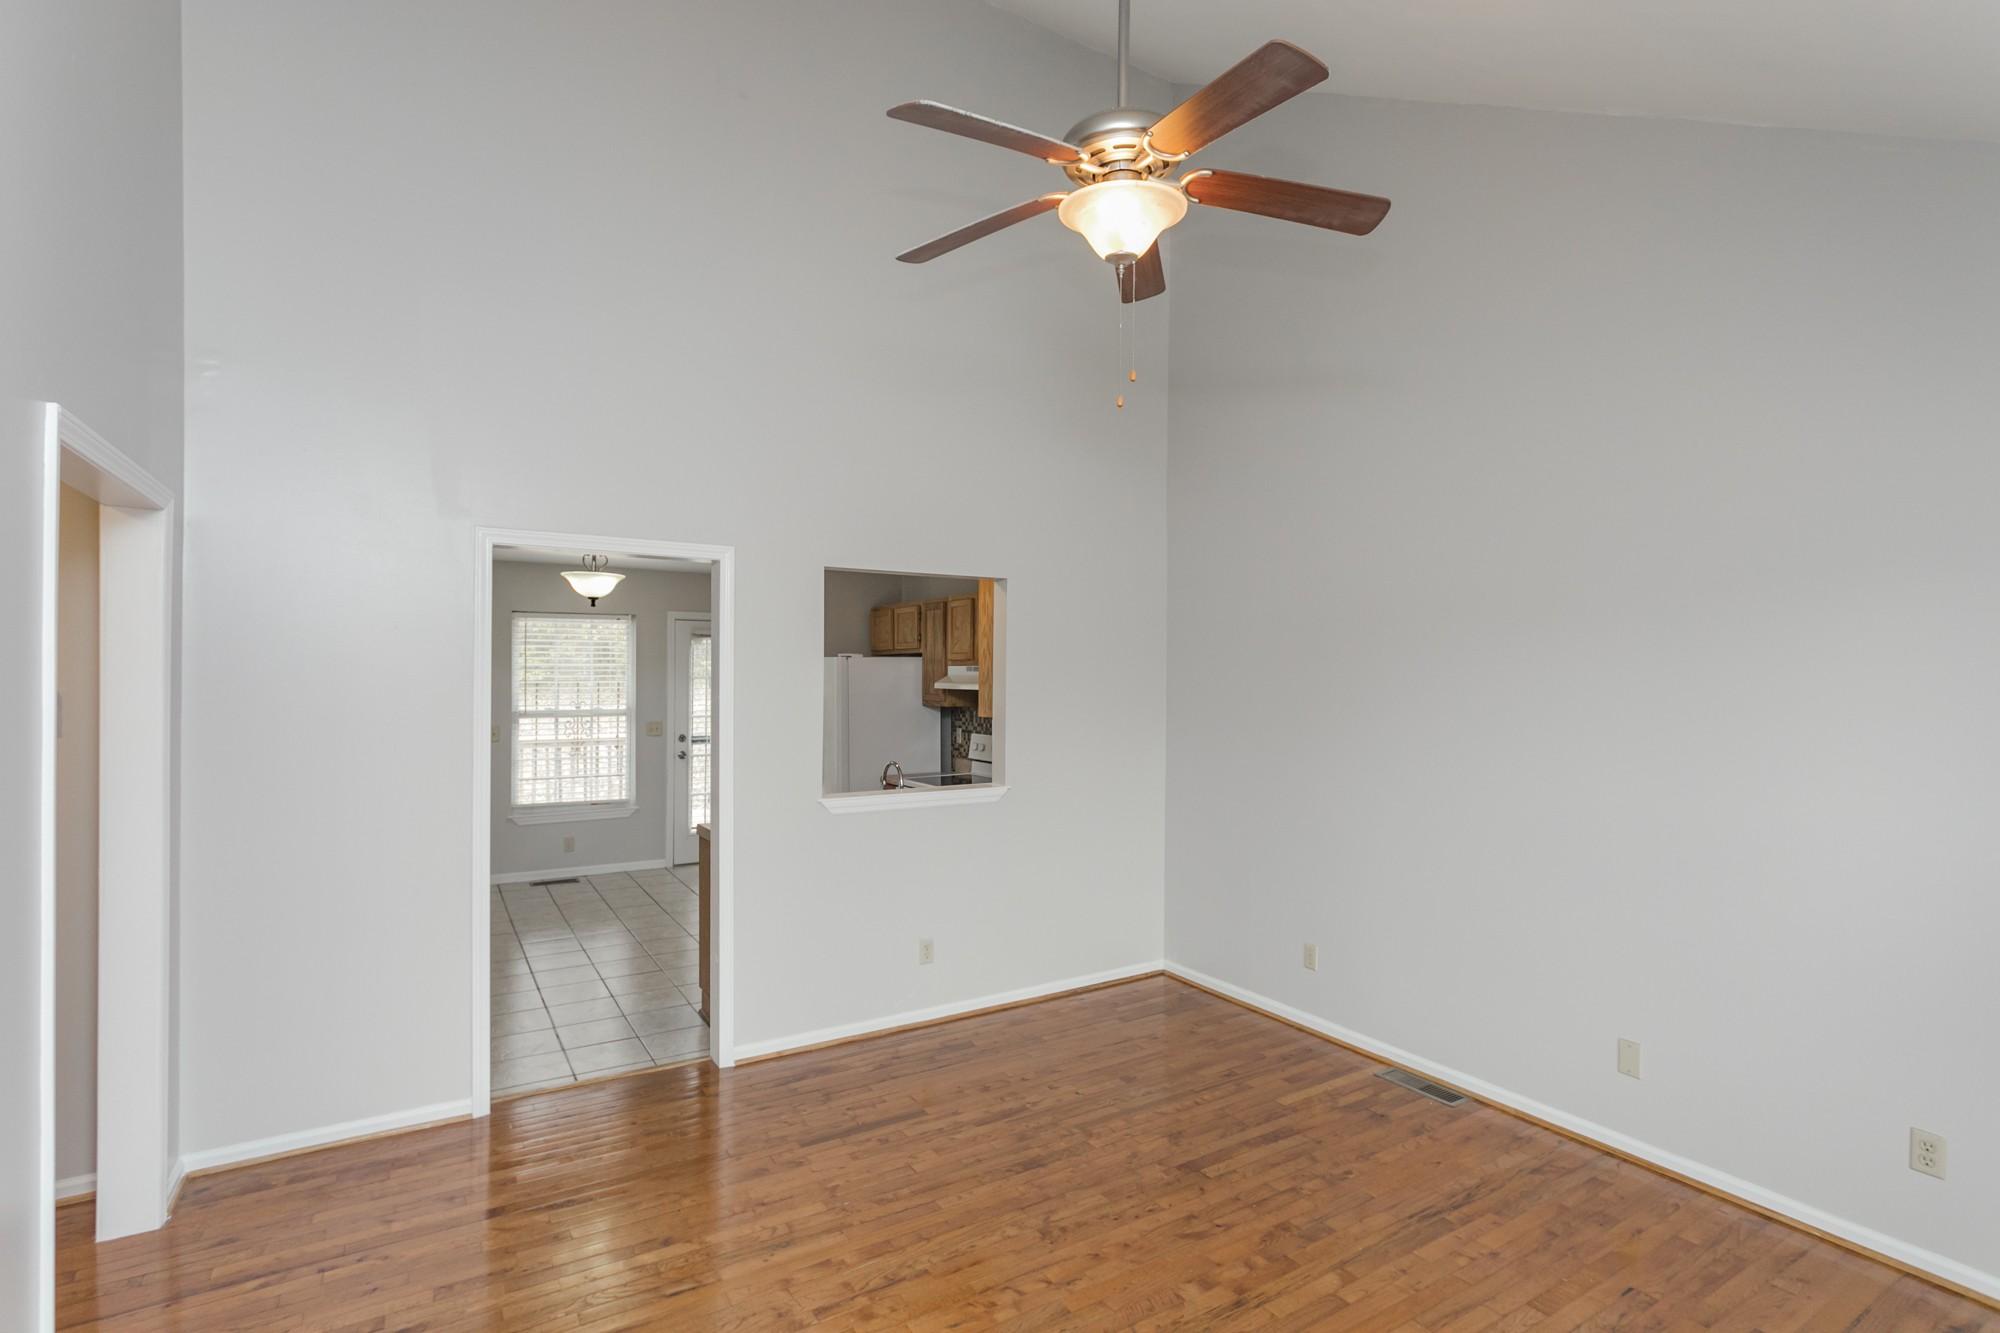 2425 Grover St, Nashville, TN 37207 - Nashville, TN real estate listing